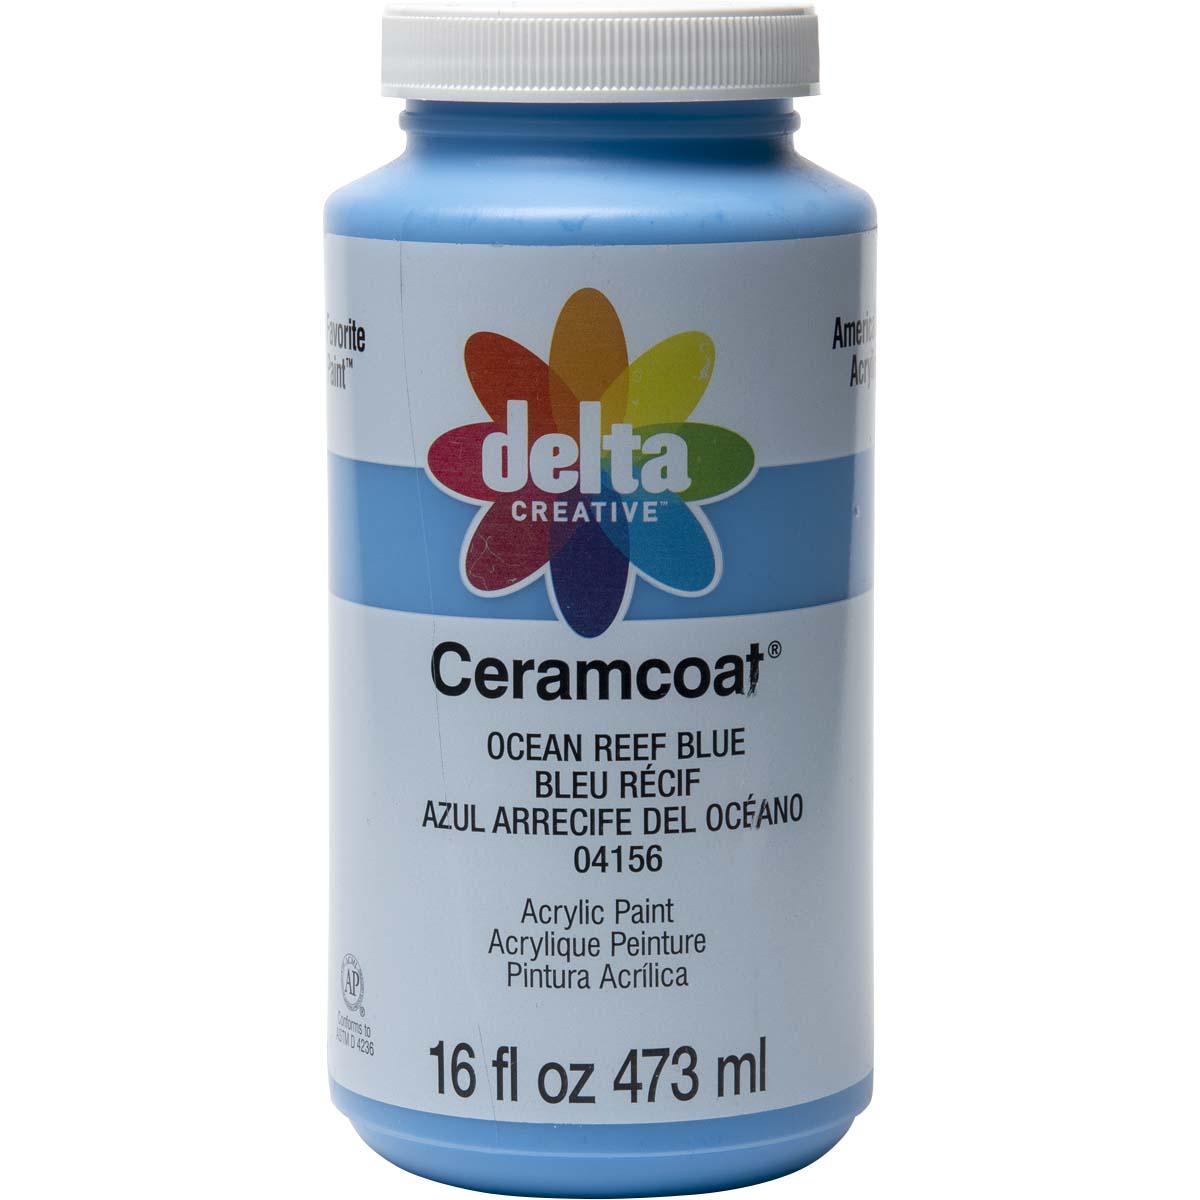 Delta Ceramcoat ® Acrylic Paint - Ocean Reef Blue, 16 oz. - 04156